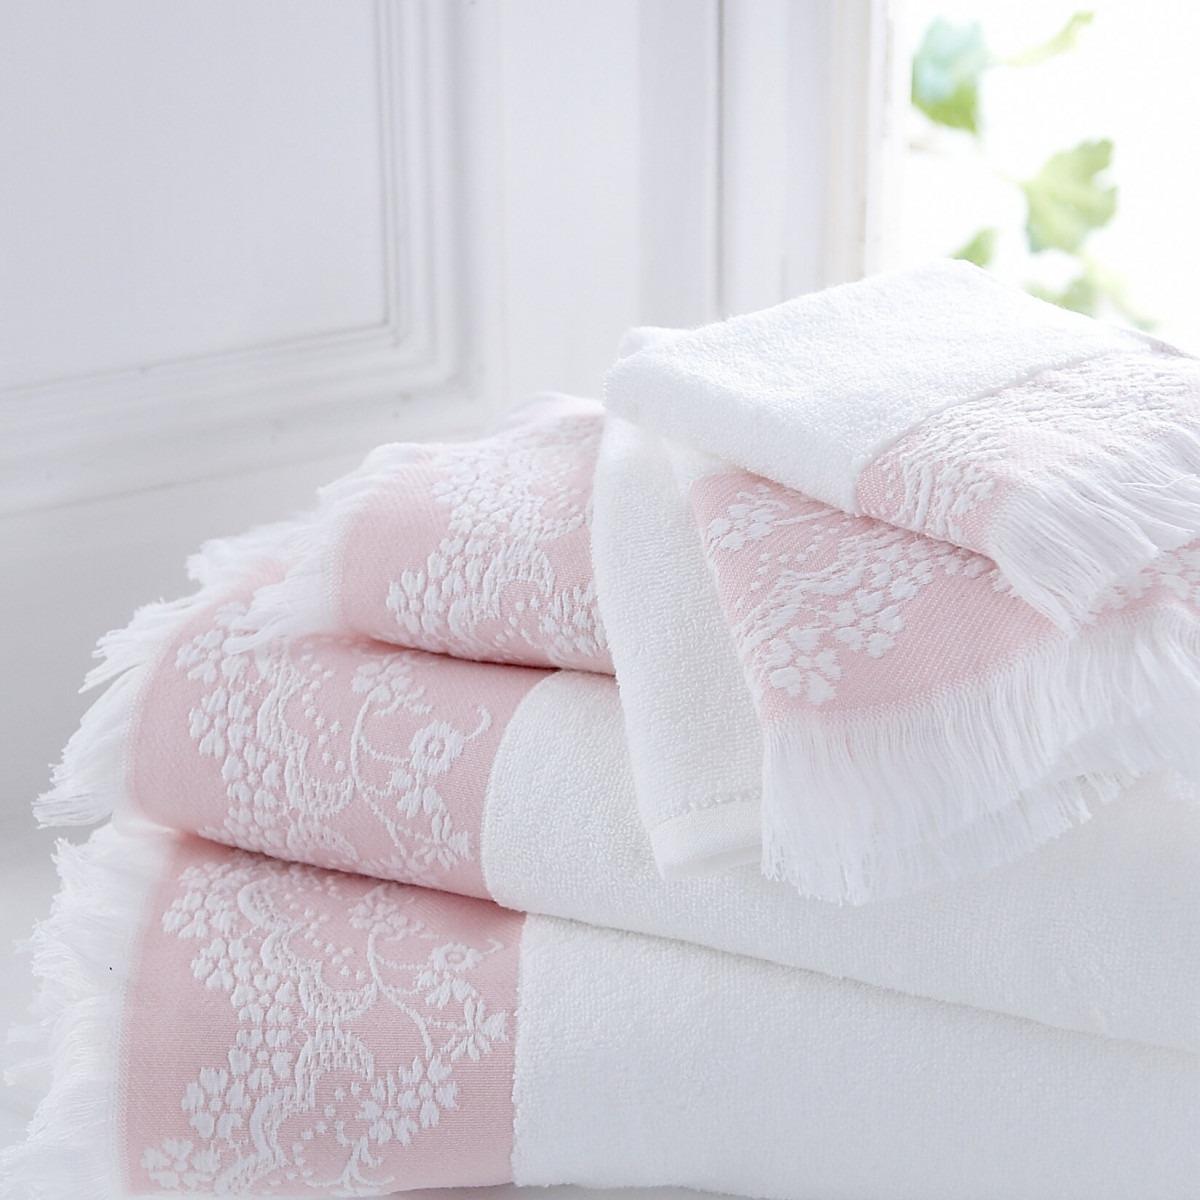 Riviera Pink White Cotton Towels